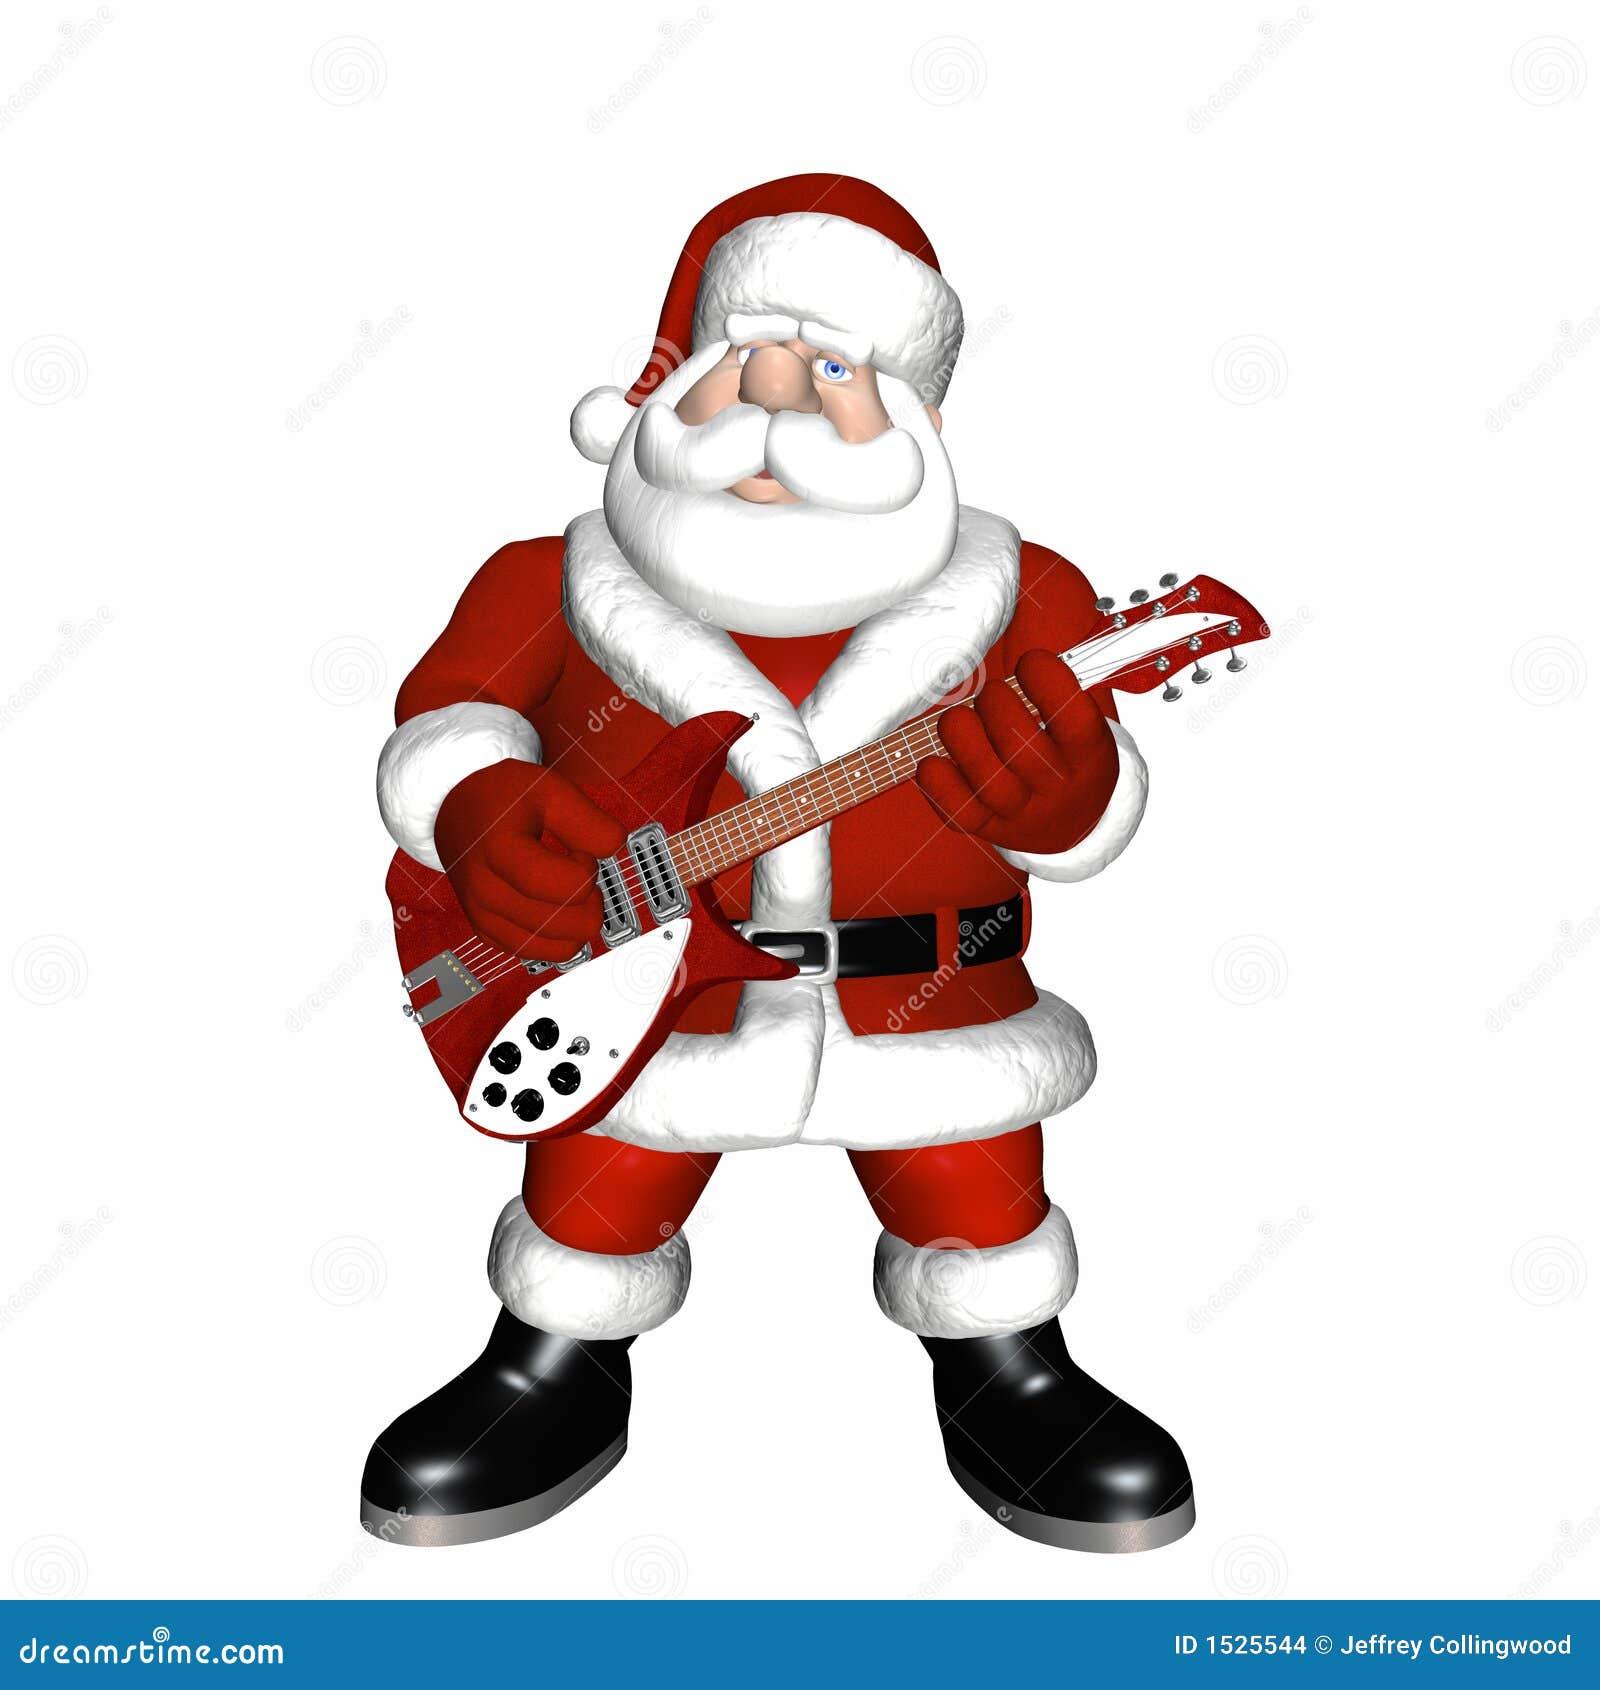 santa playing a guitar 1 stock illustration illustration clip art music instruments clip art music instruments